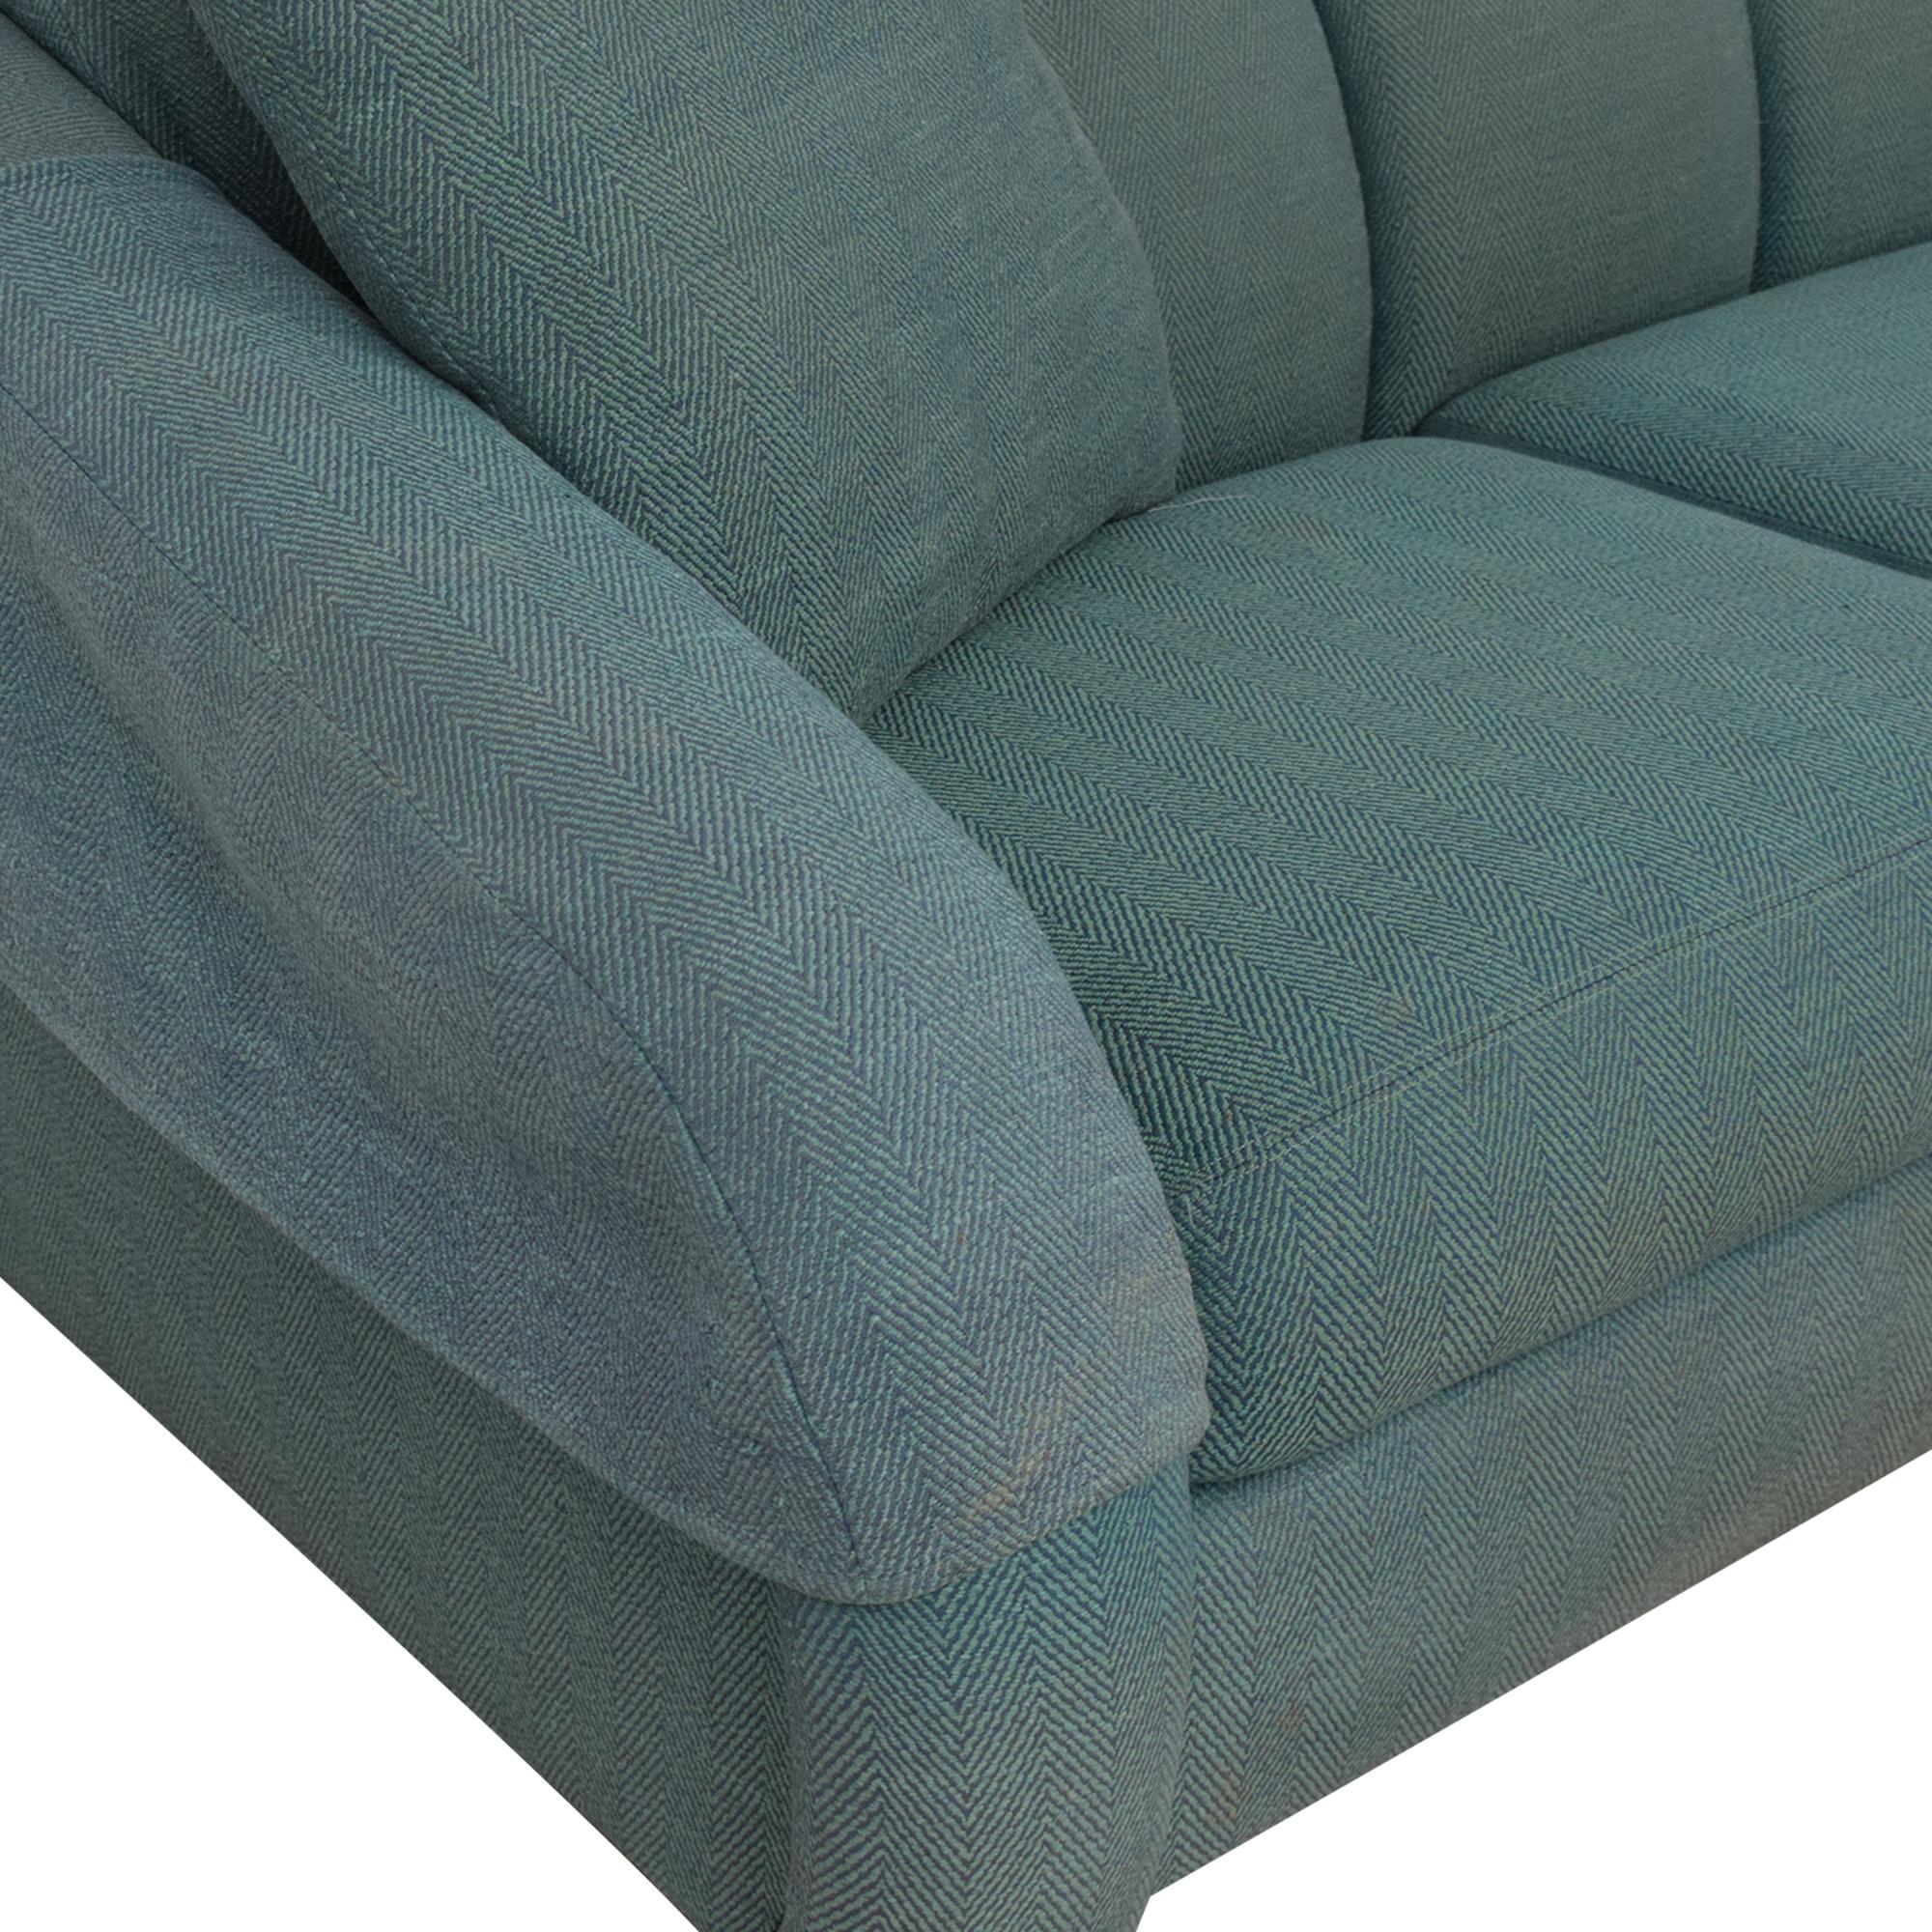 Directional Furniture Sectional Sofa / Sofas